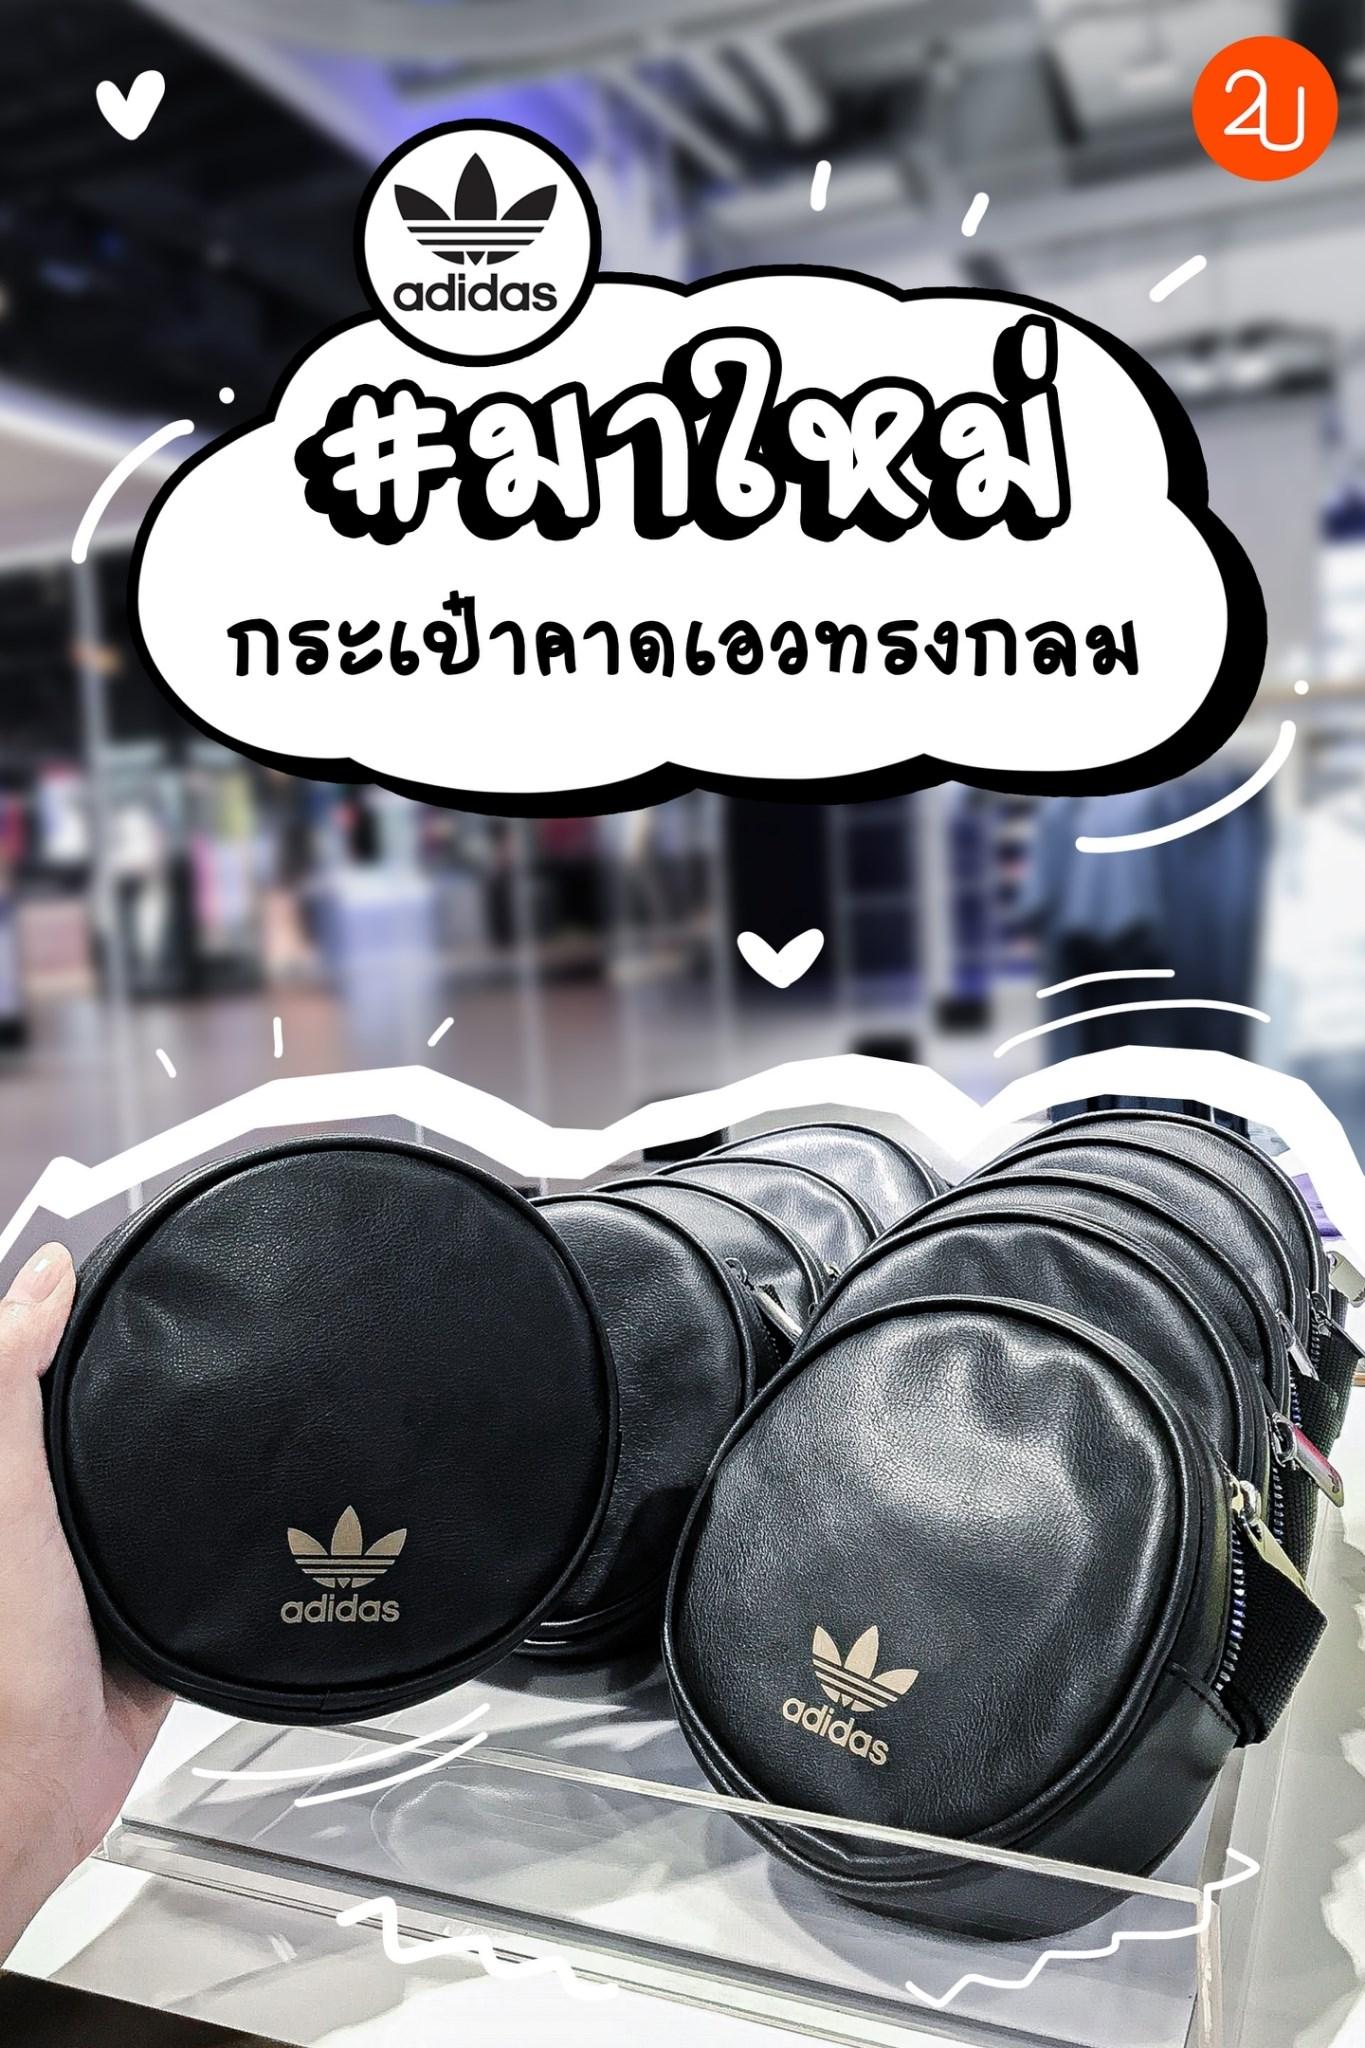 Adidas Round Waist Bag